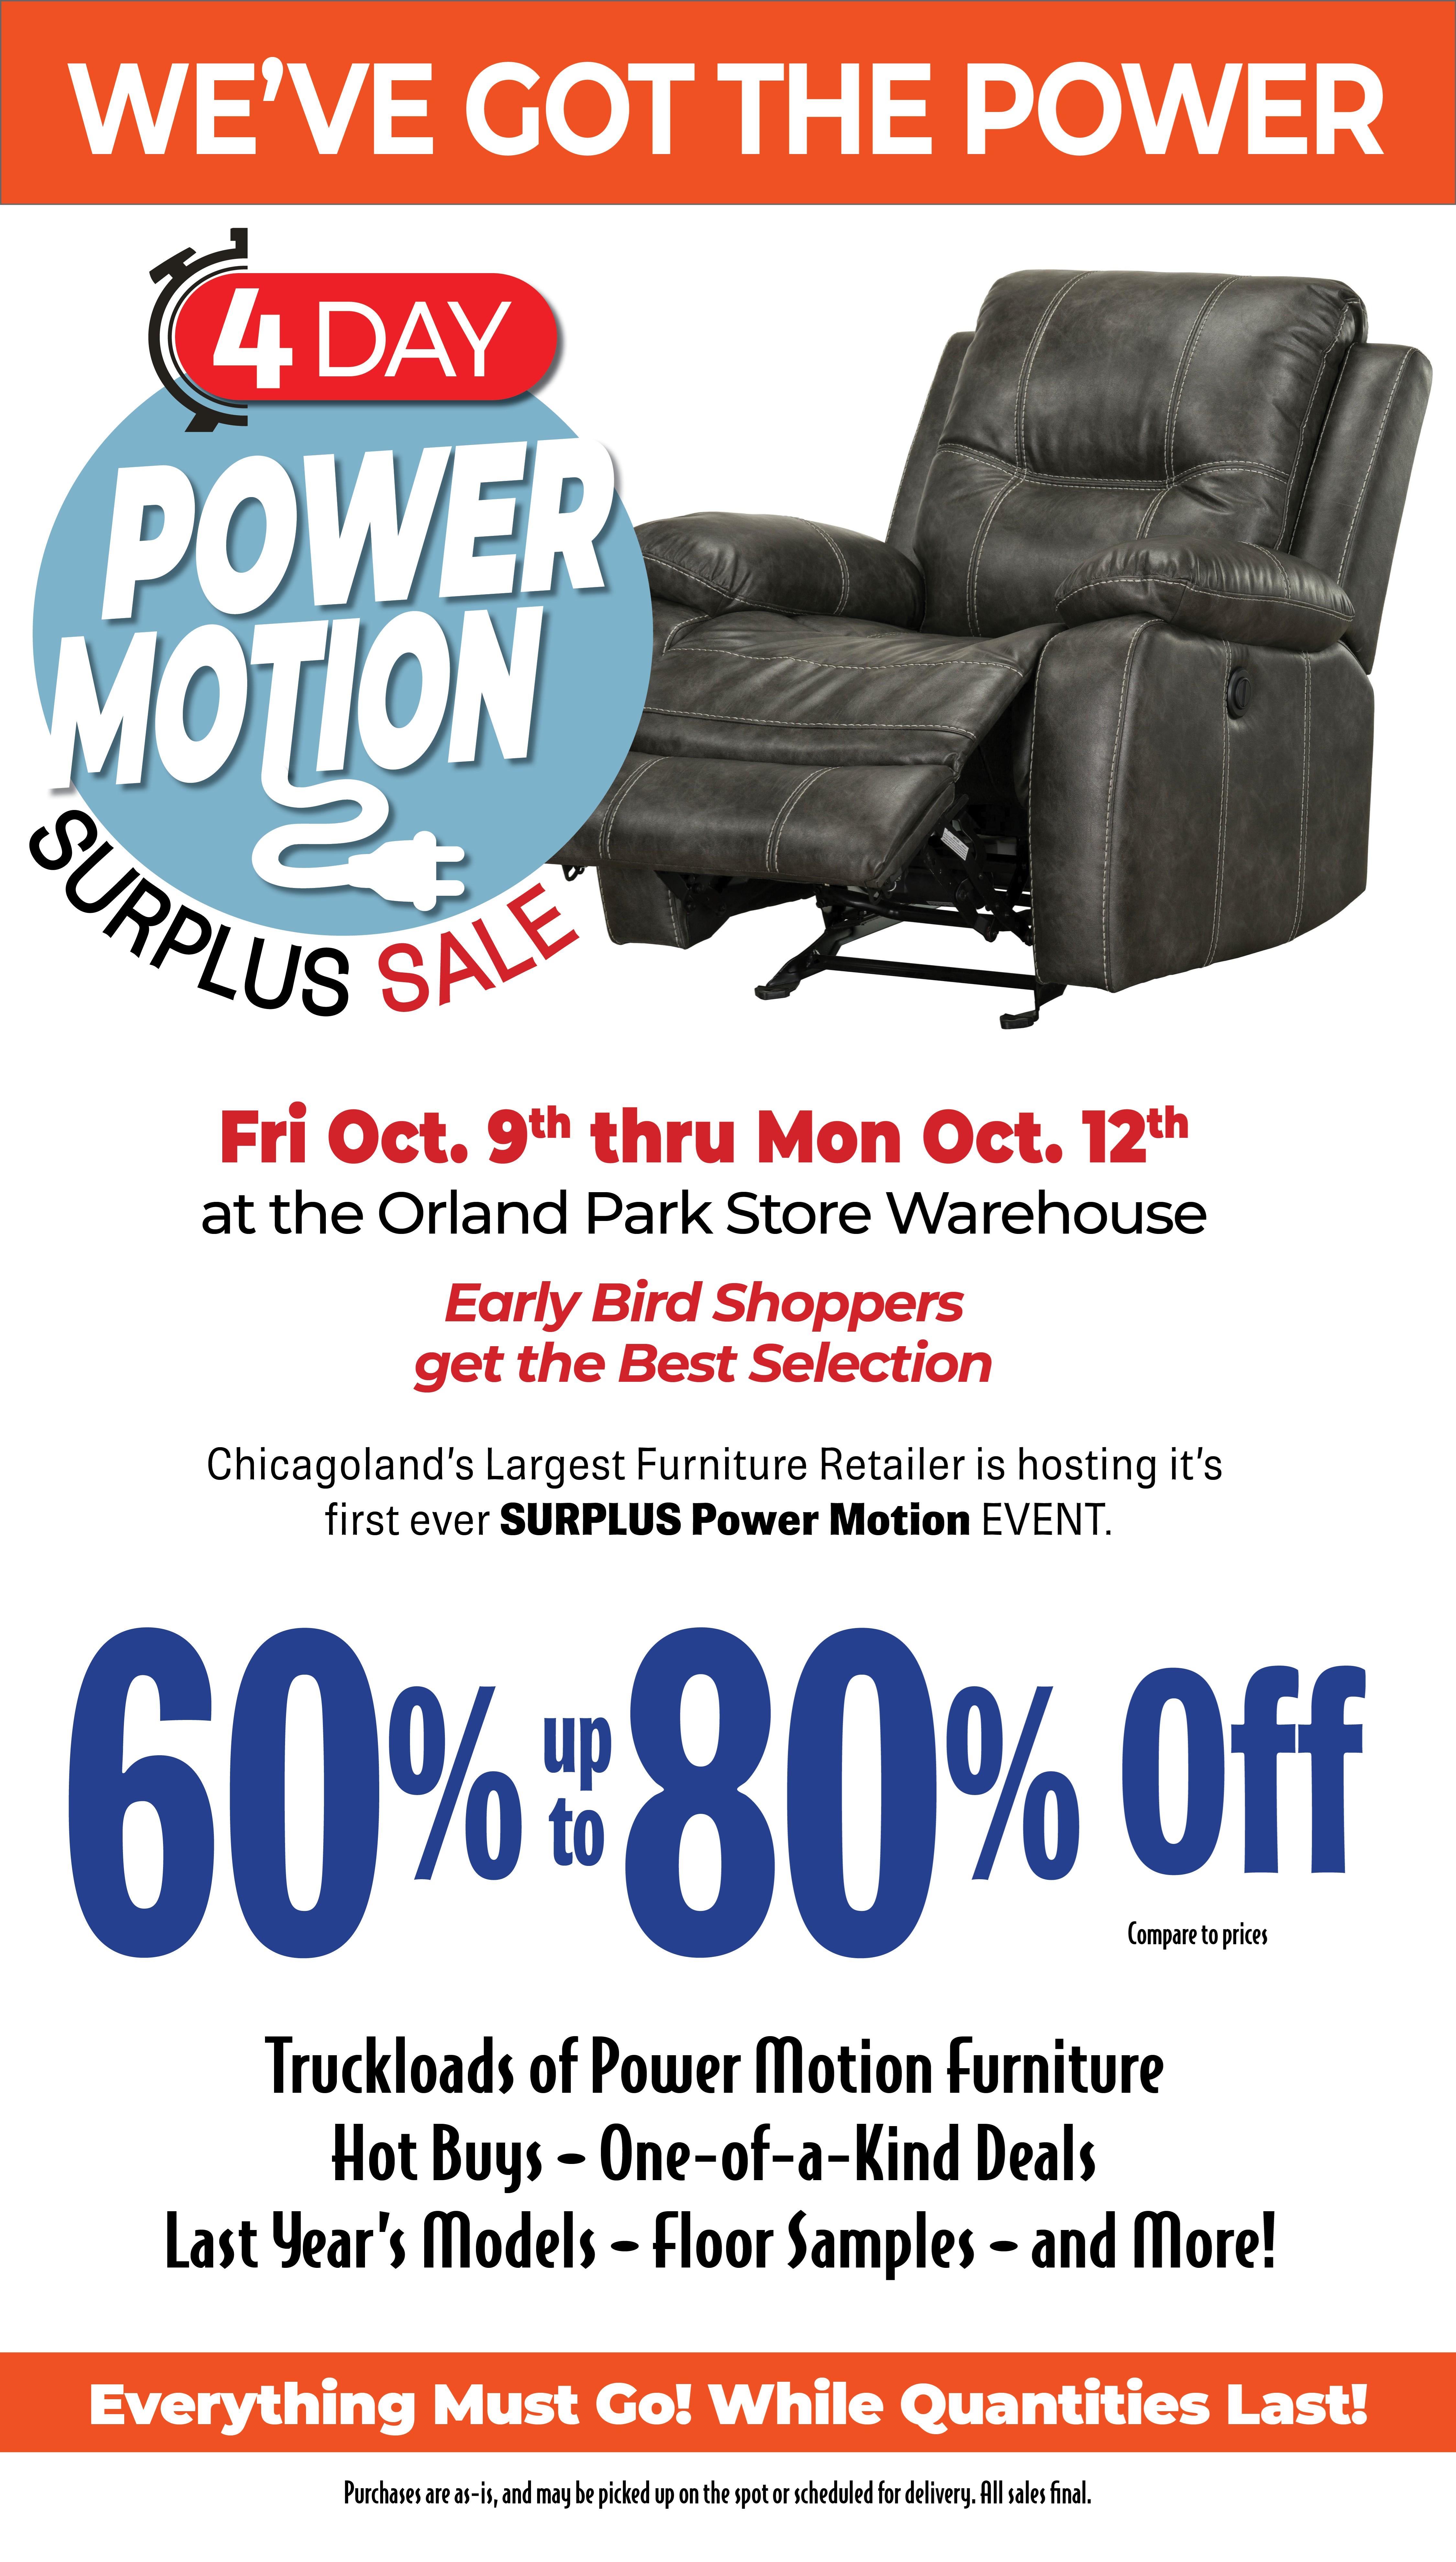 Surplus Power Motion Event Darvin Furniture Orland Park Chicago Il